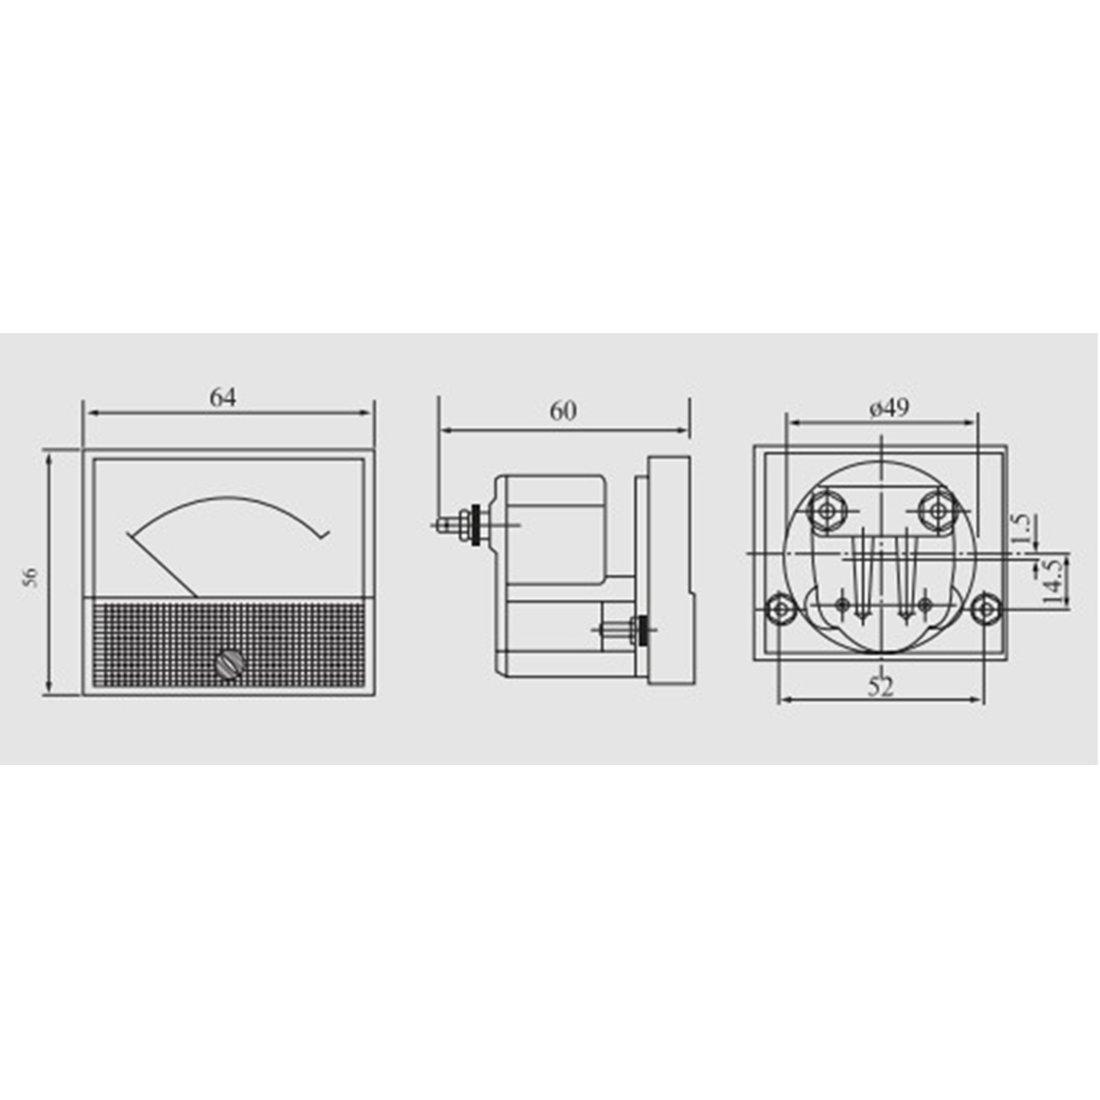 85C1-A Analog Stromanzeigeger/ät DC 50A Amperemeter Ampere Pr/üfger/ät DE de sourcing map 1 Stk